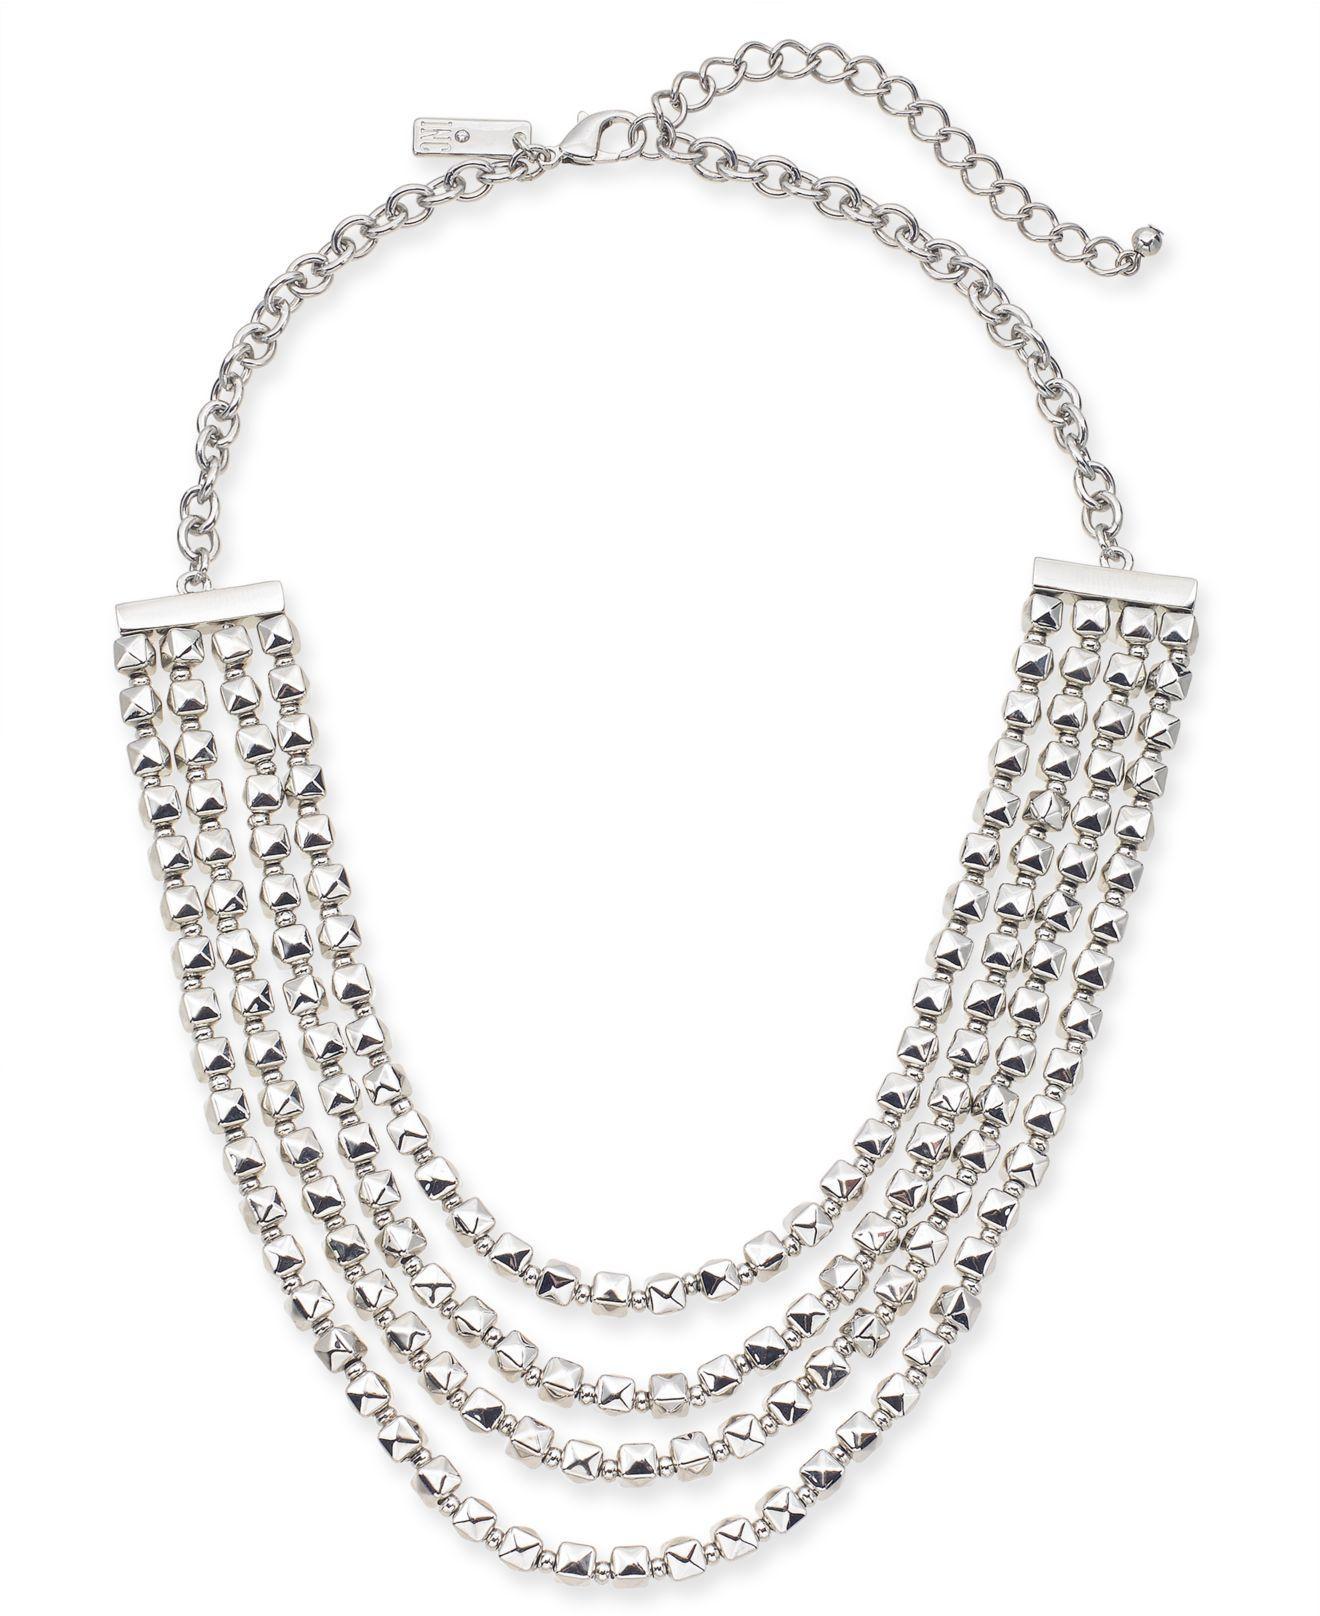 Inc International Concepts I N C Silver Tone Nugget Bead